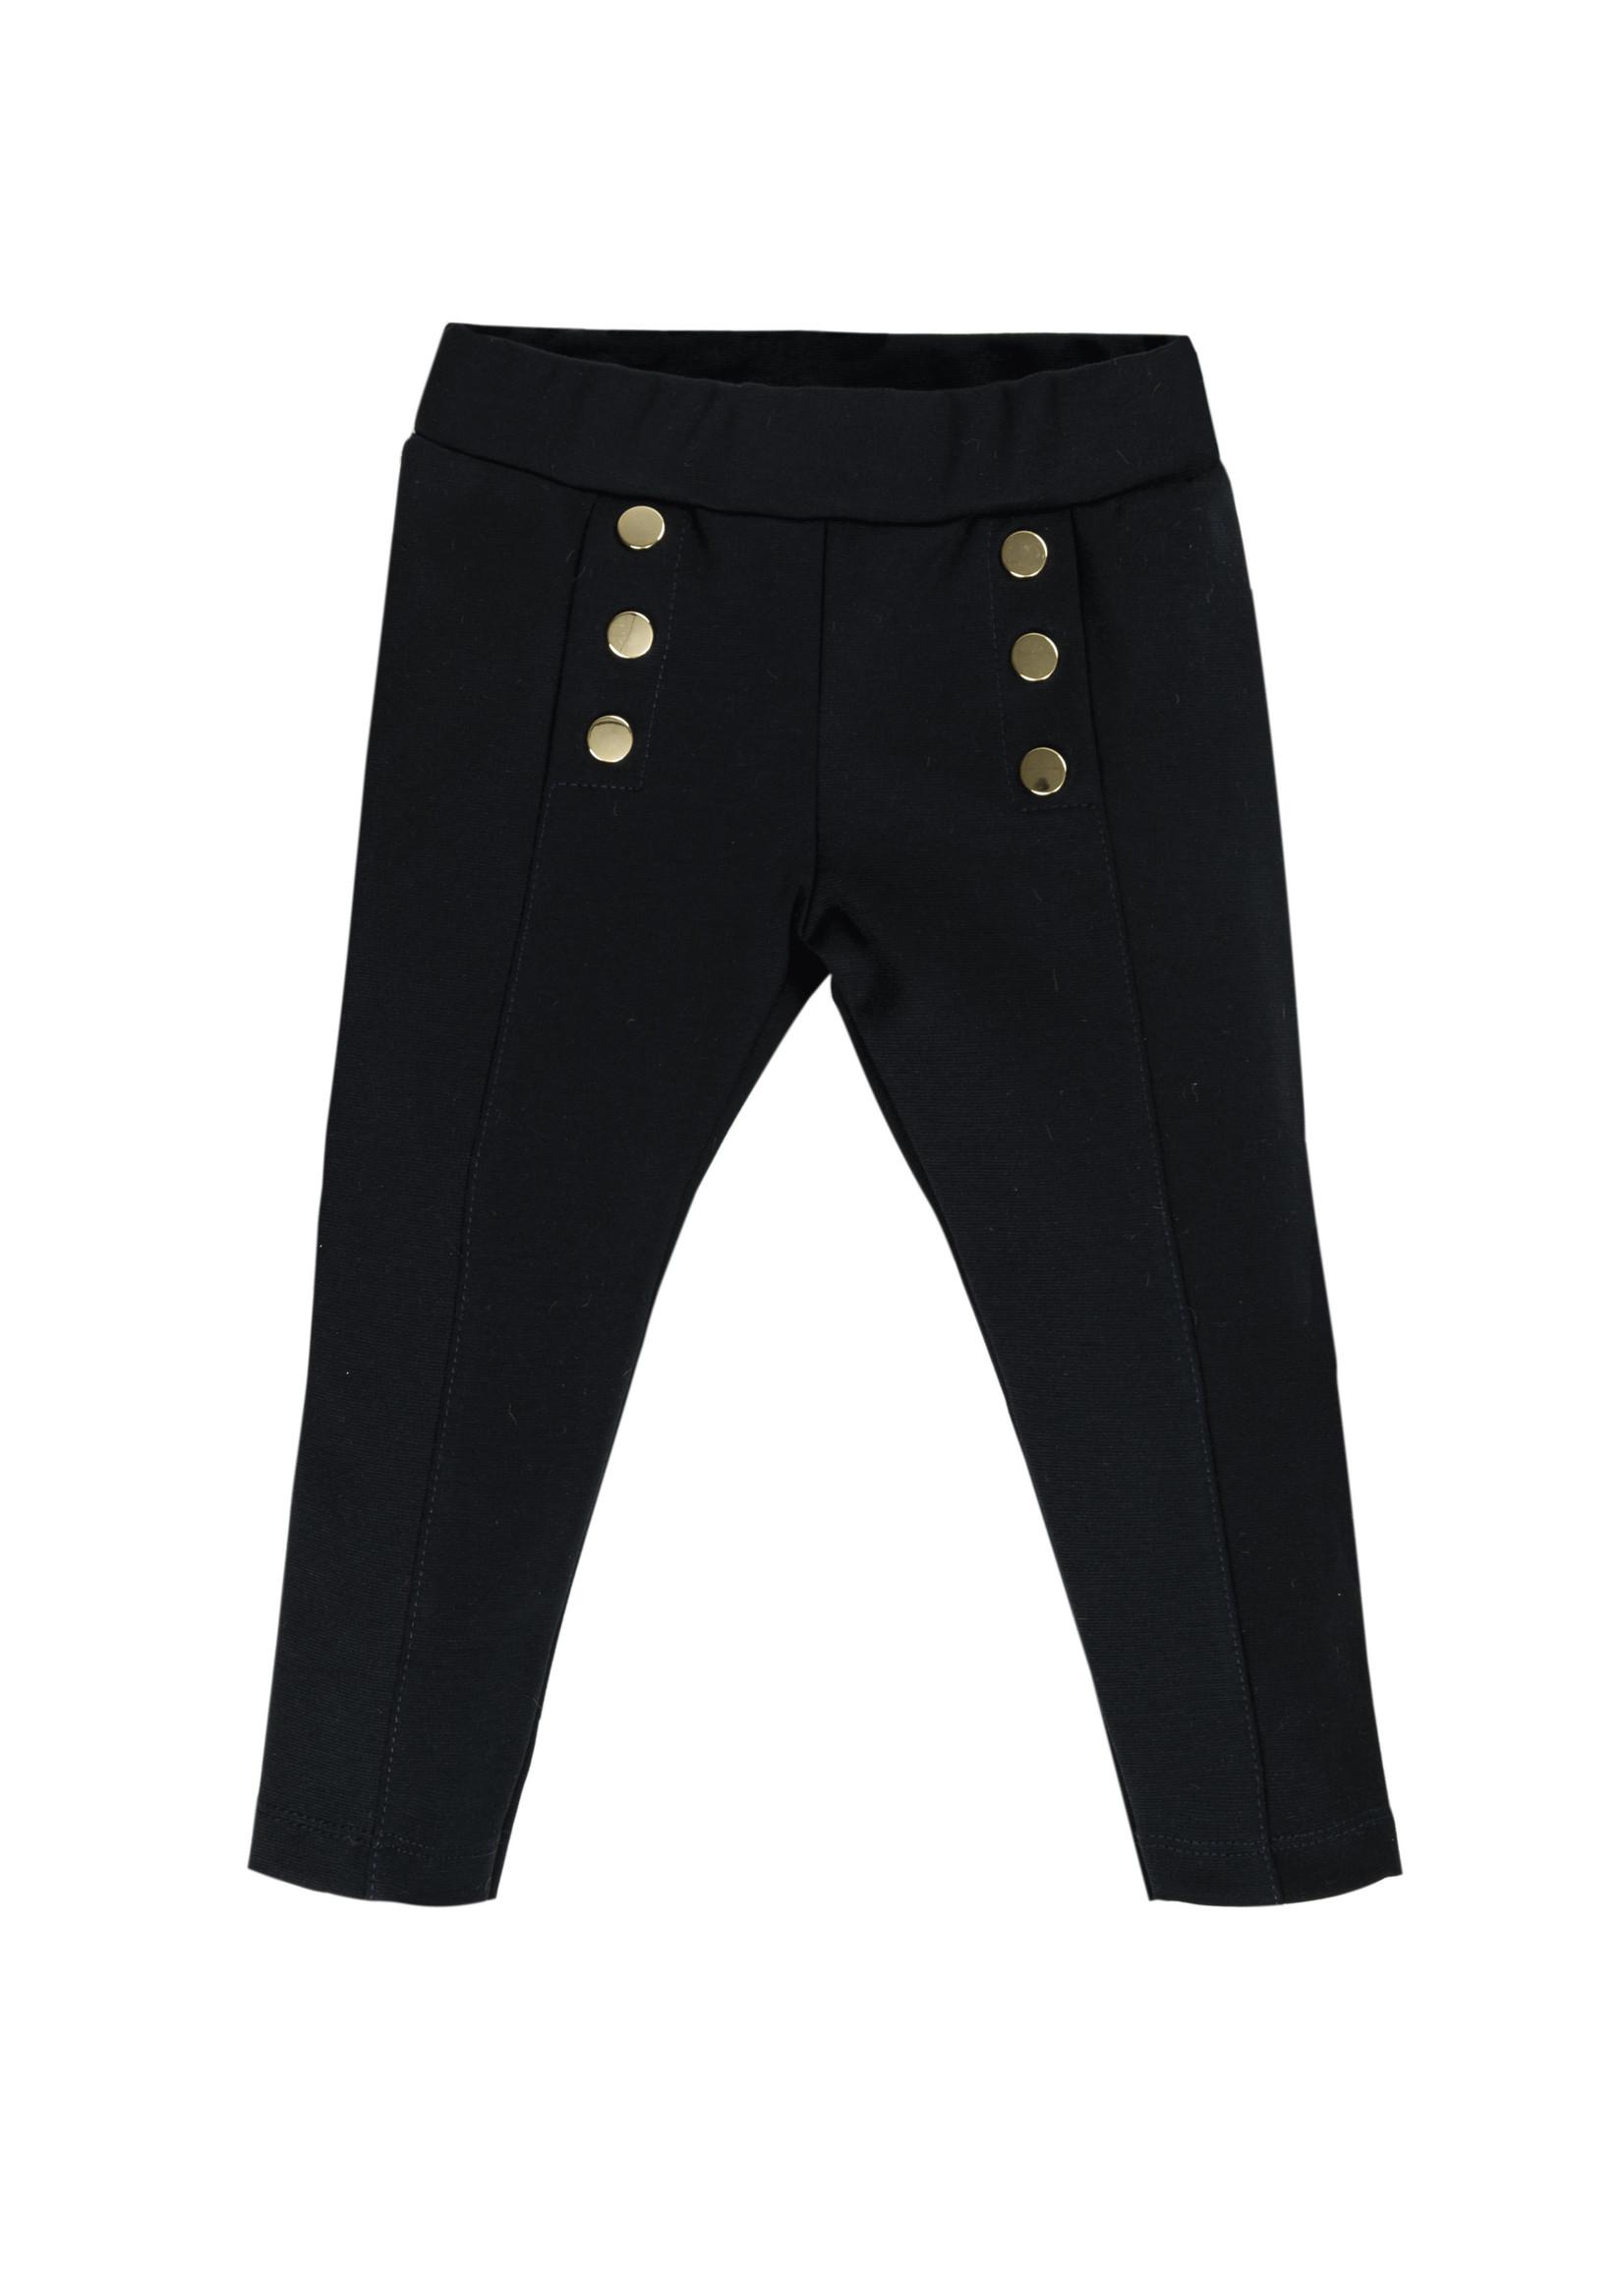 EMC EMC stitch trousers black